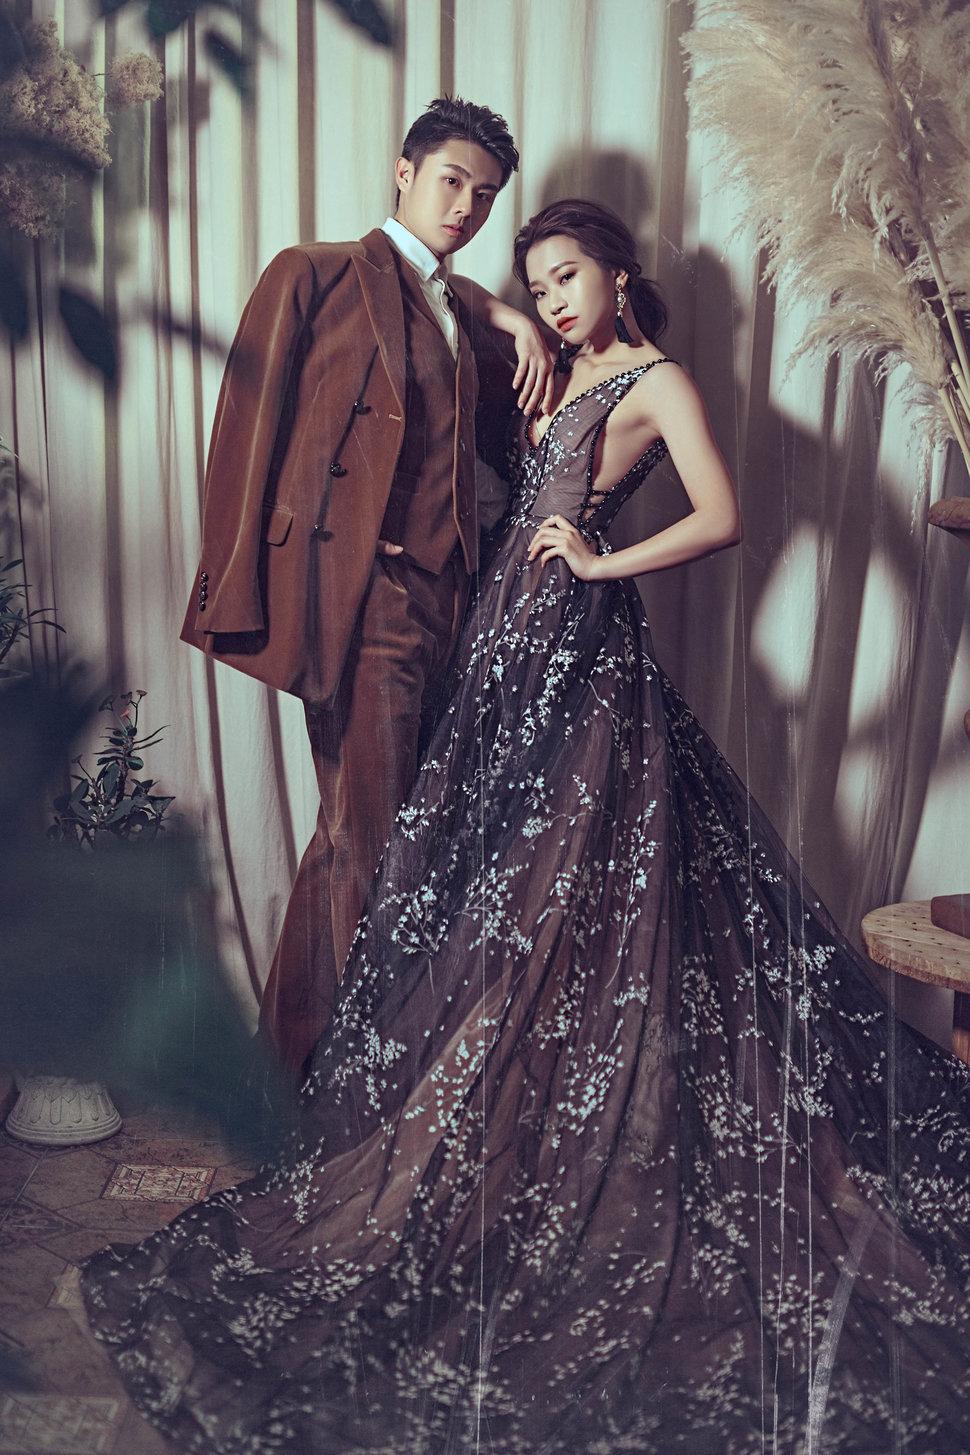 000 - IN LACE 品牌婚紗 ‧ 手工訂製《結婚吧》